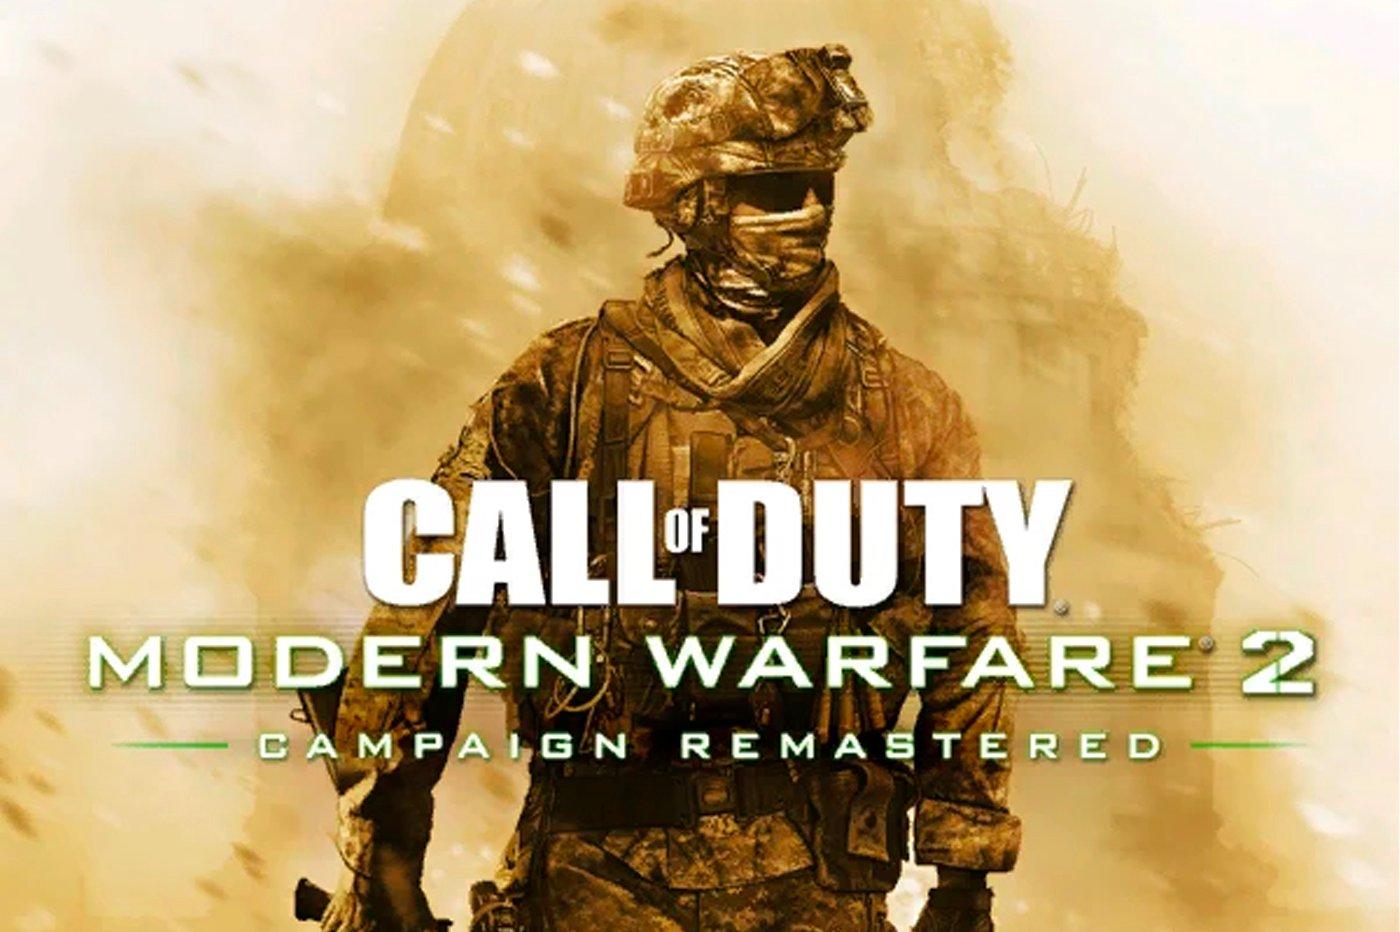 https://www.presse-citron.net/wordpress_prod/wp-content/uploads/2020/03/call-of-duty-moder-warfare-2-remastered.jpg